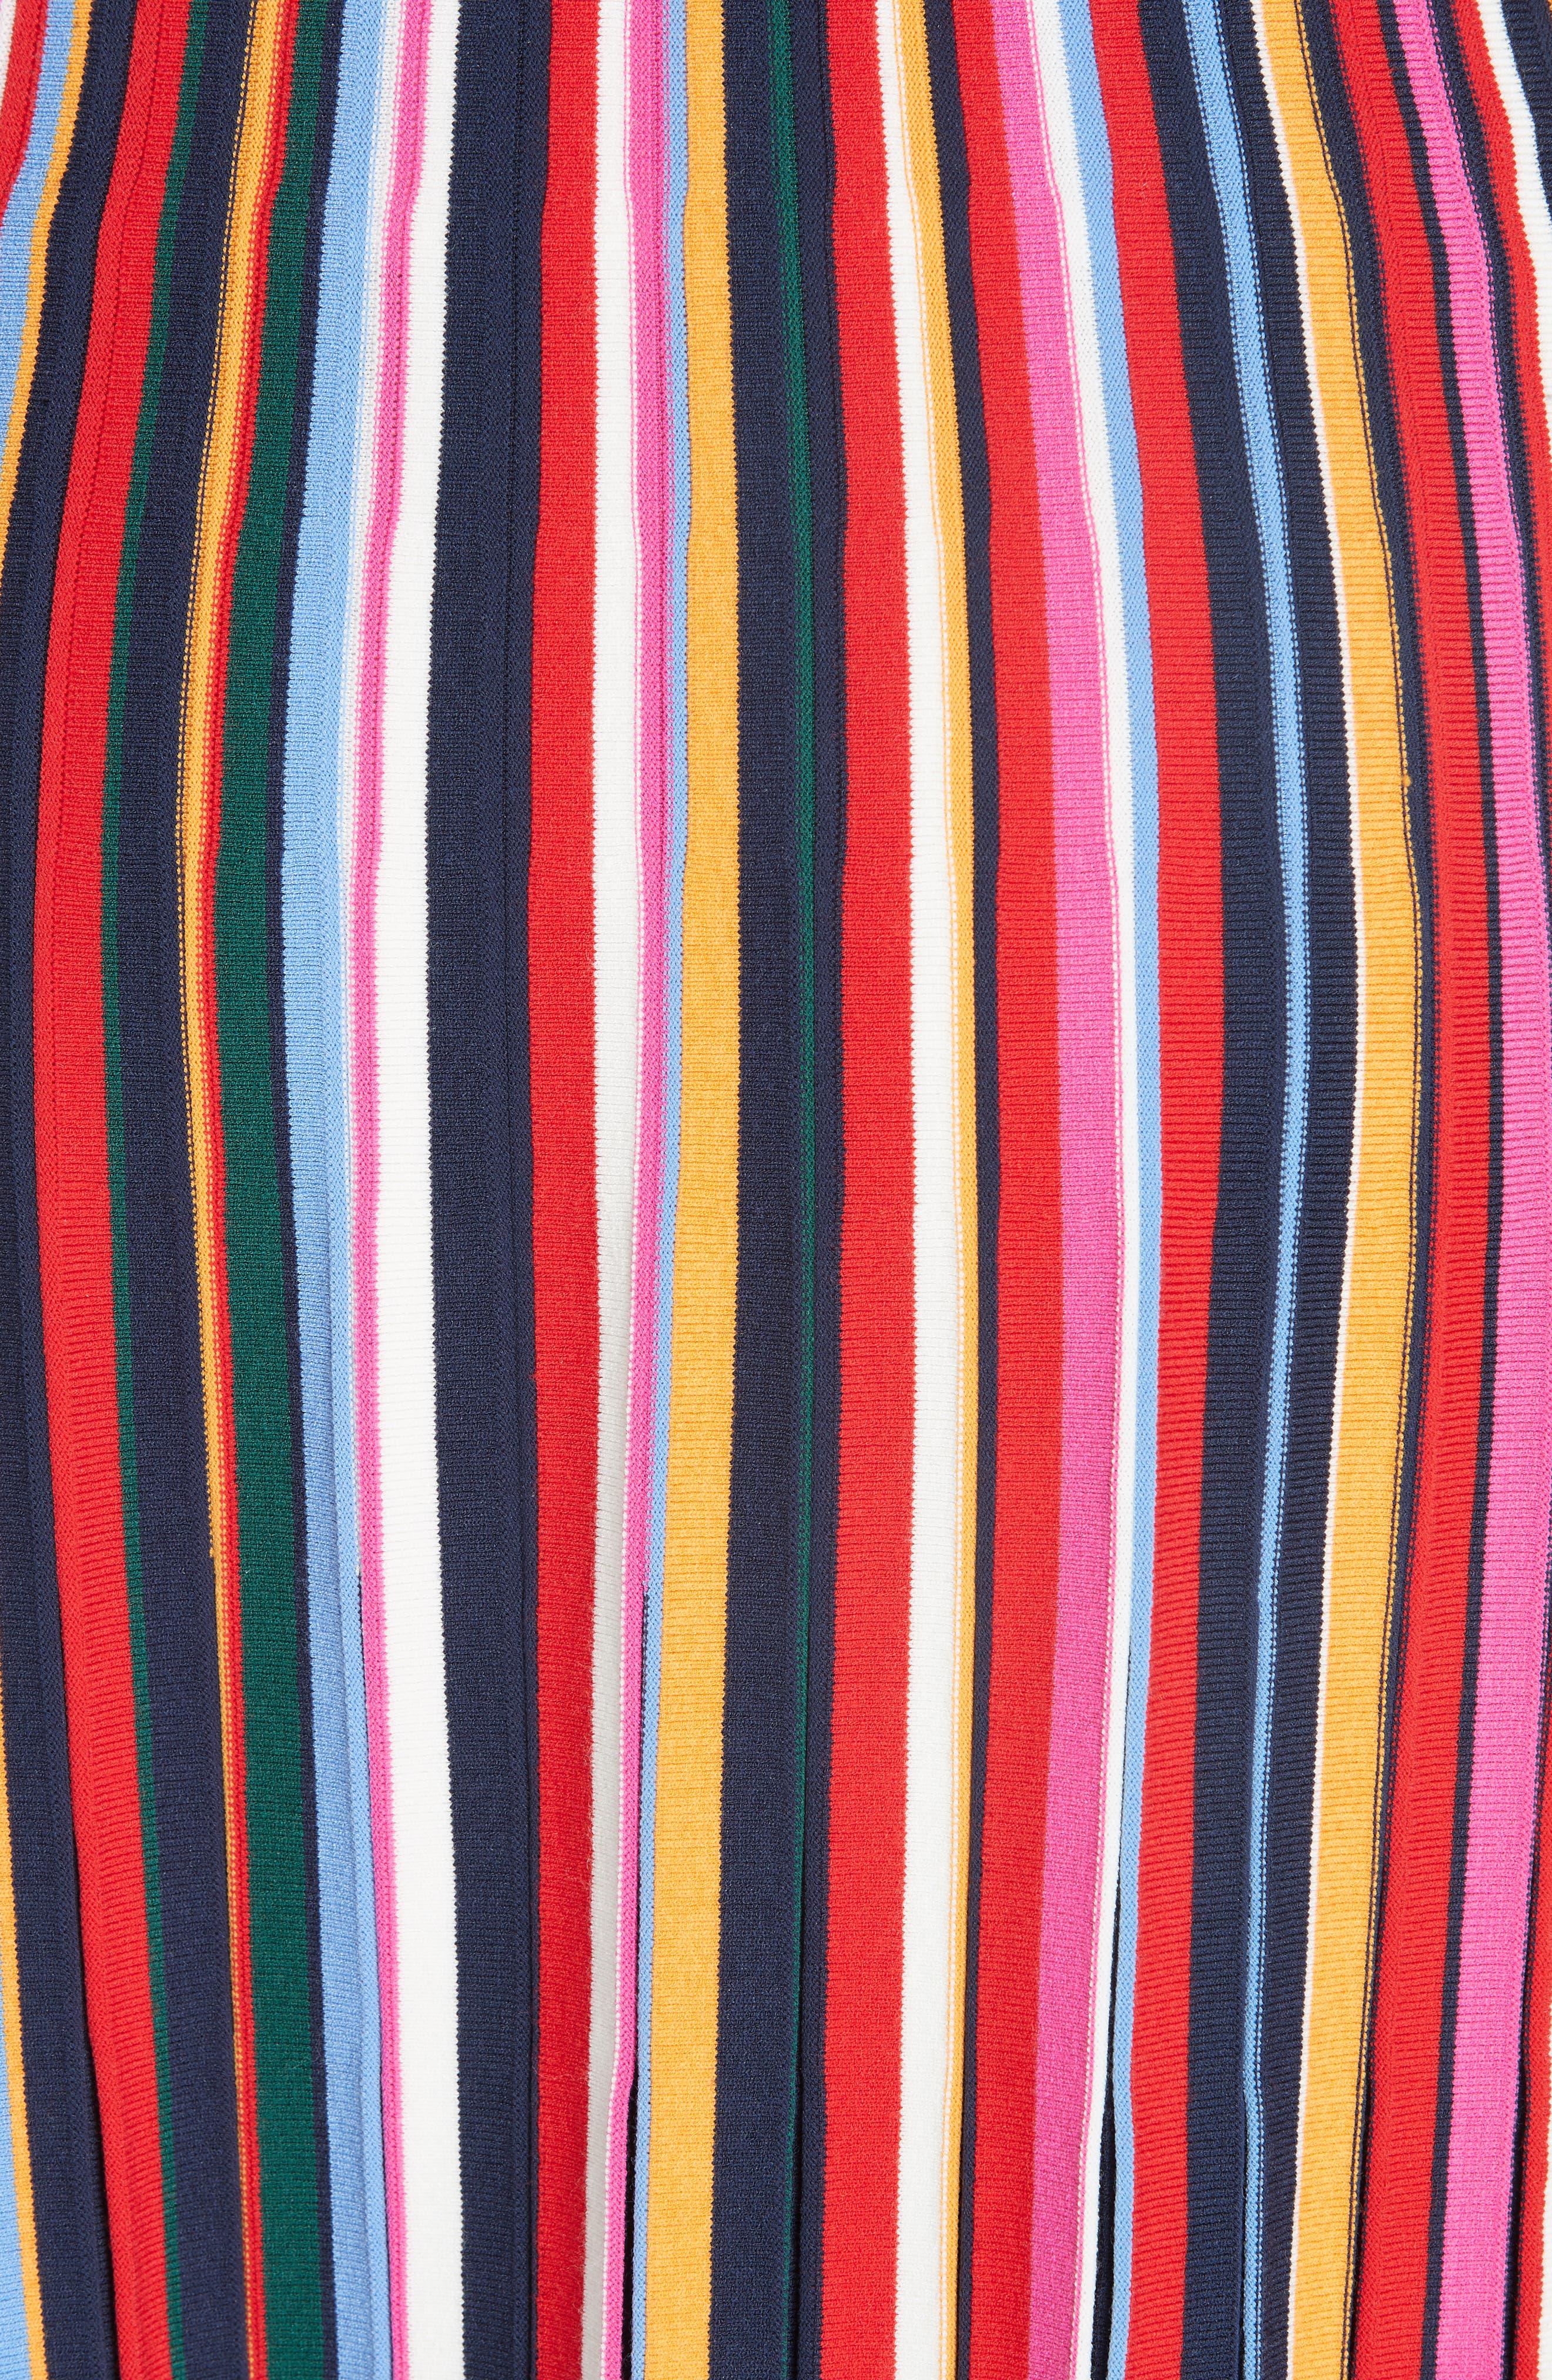 Ellis Stripe Pleated Skirt,                             Alternate thumbnail 5, color,                             405